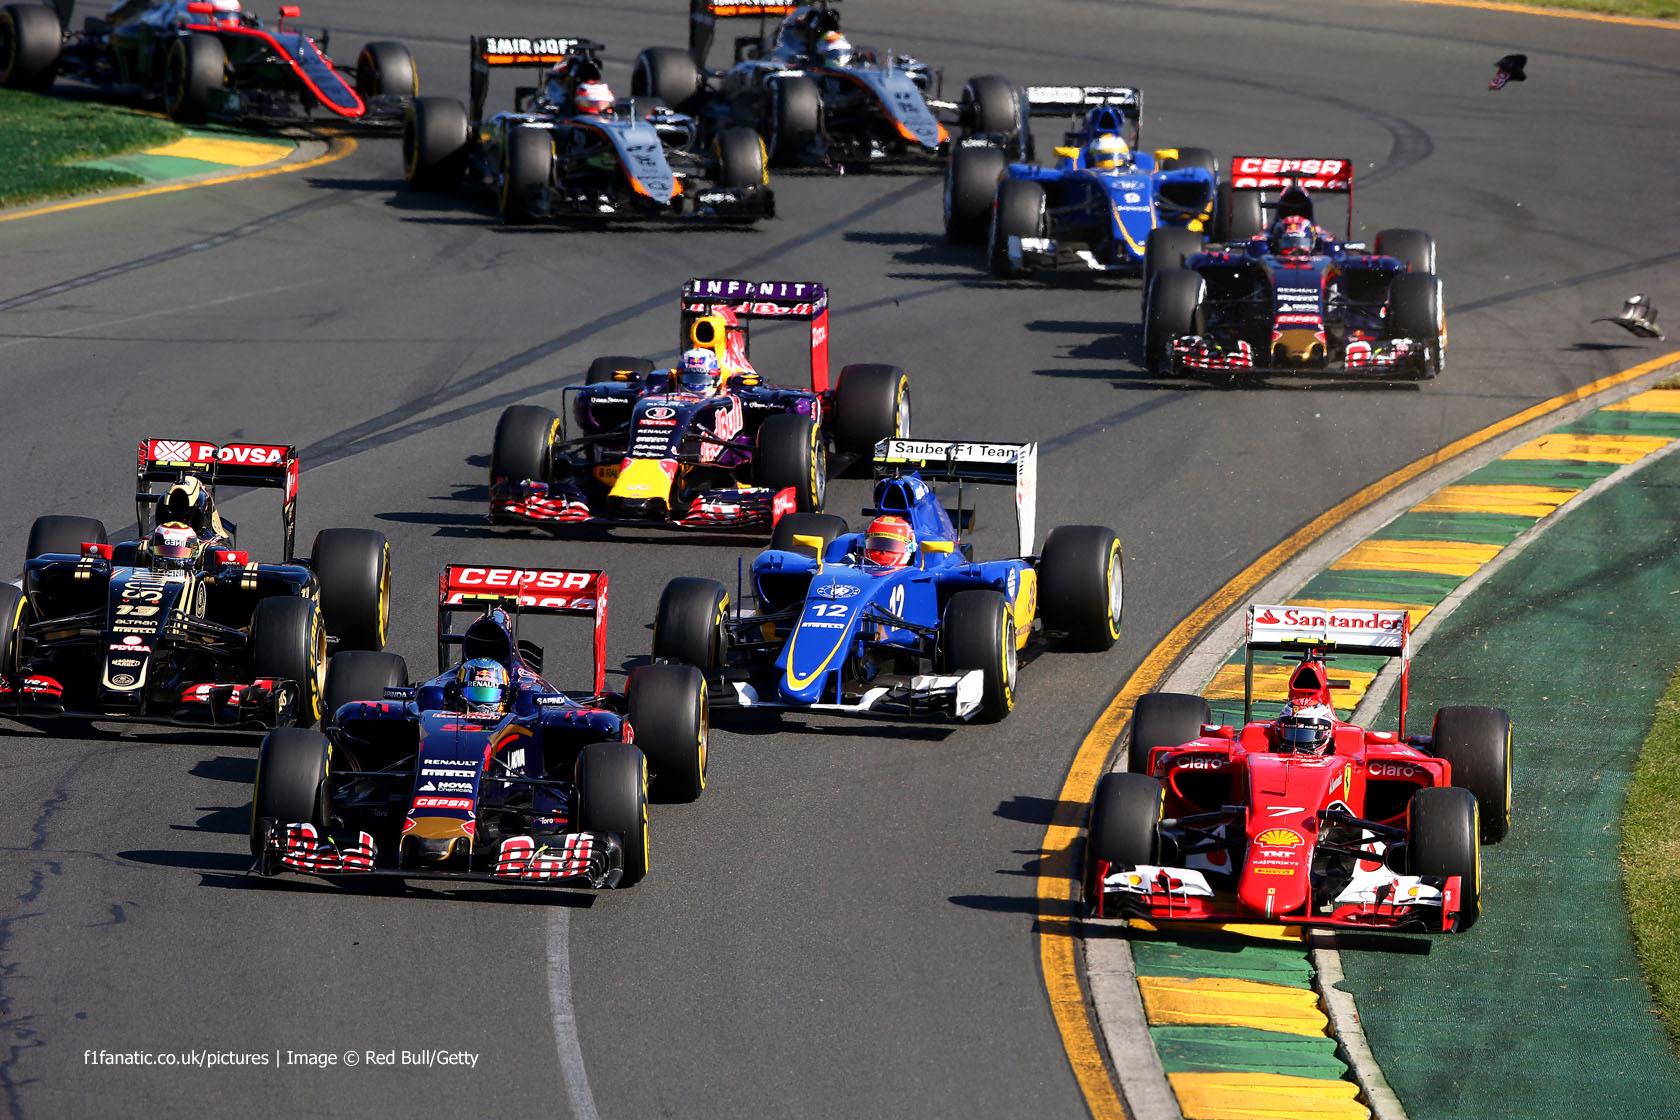 The 2015 Australian Grand Prix